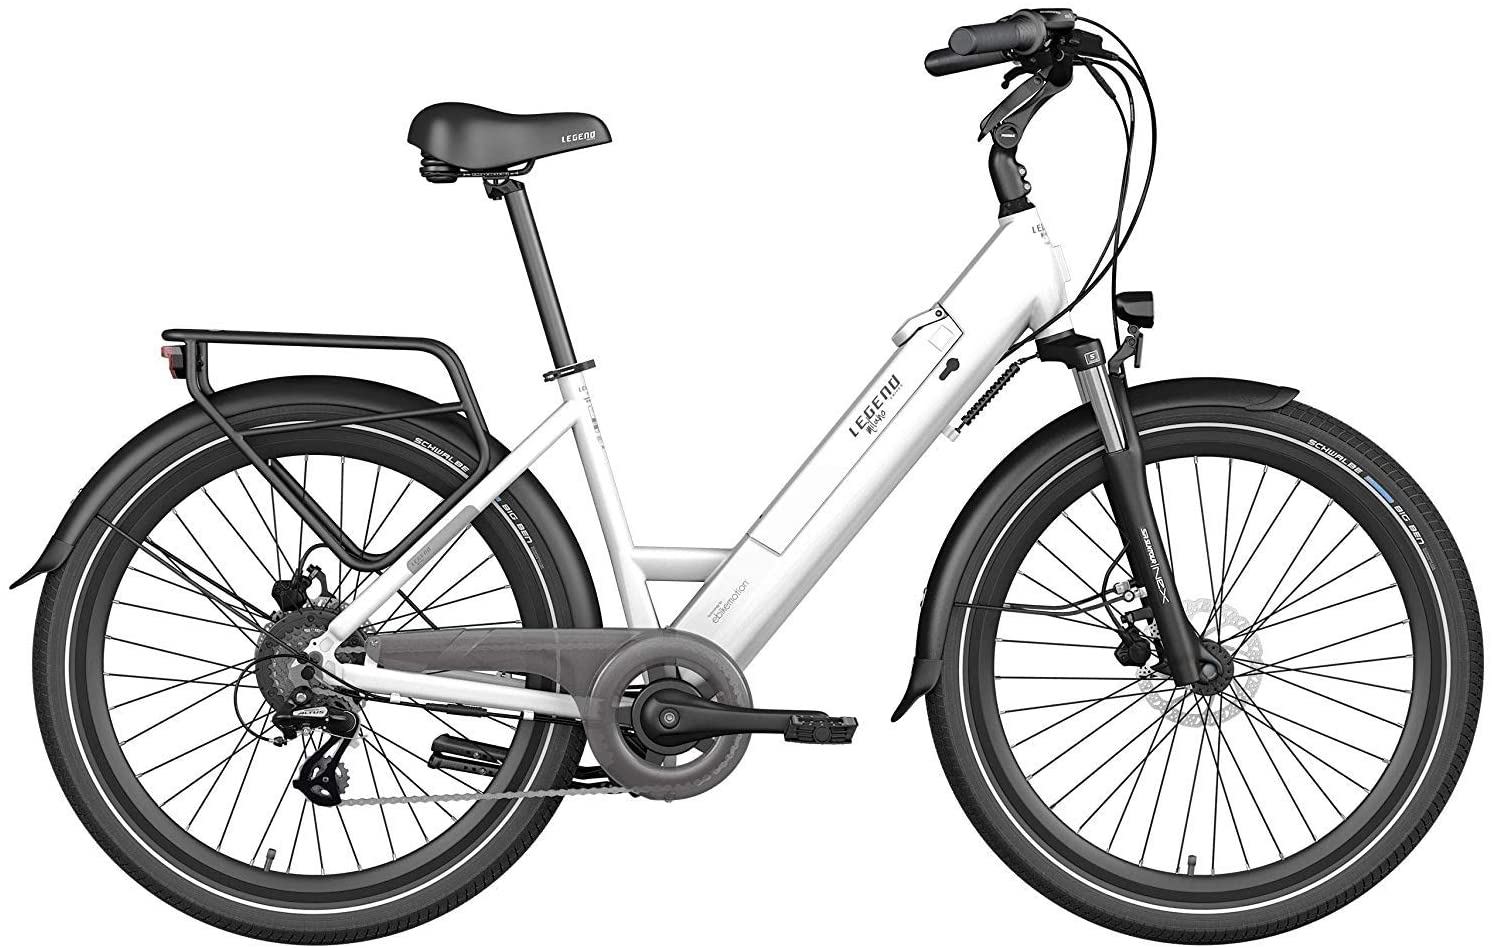 Smart Ladies Electric Bike Legend Milano Standard Battery 10.4ah White